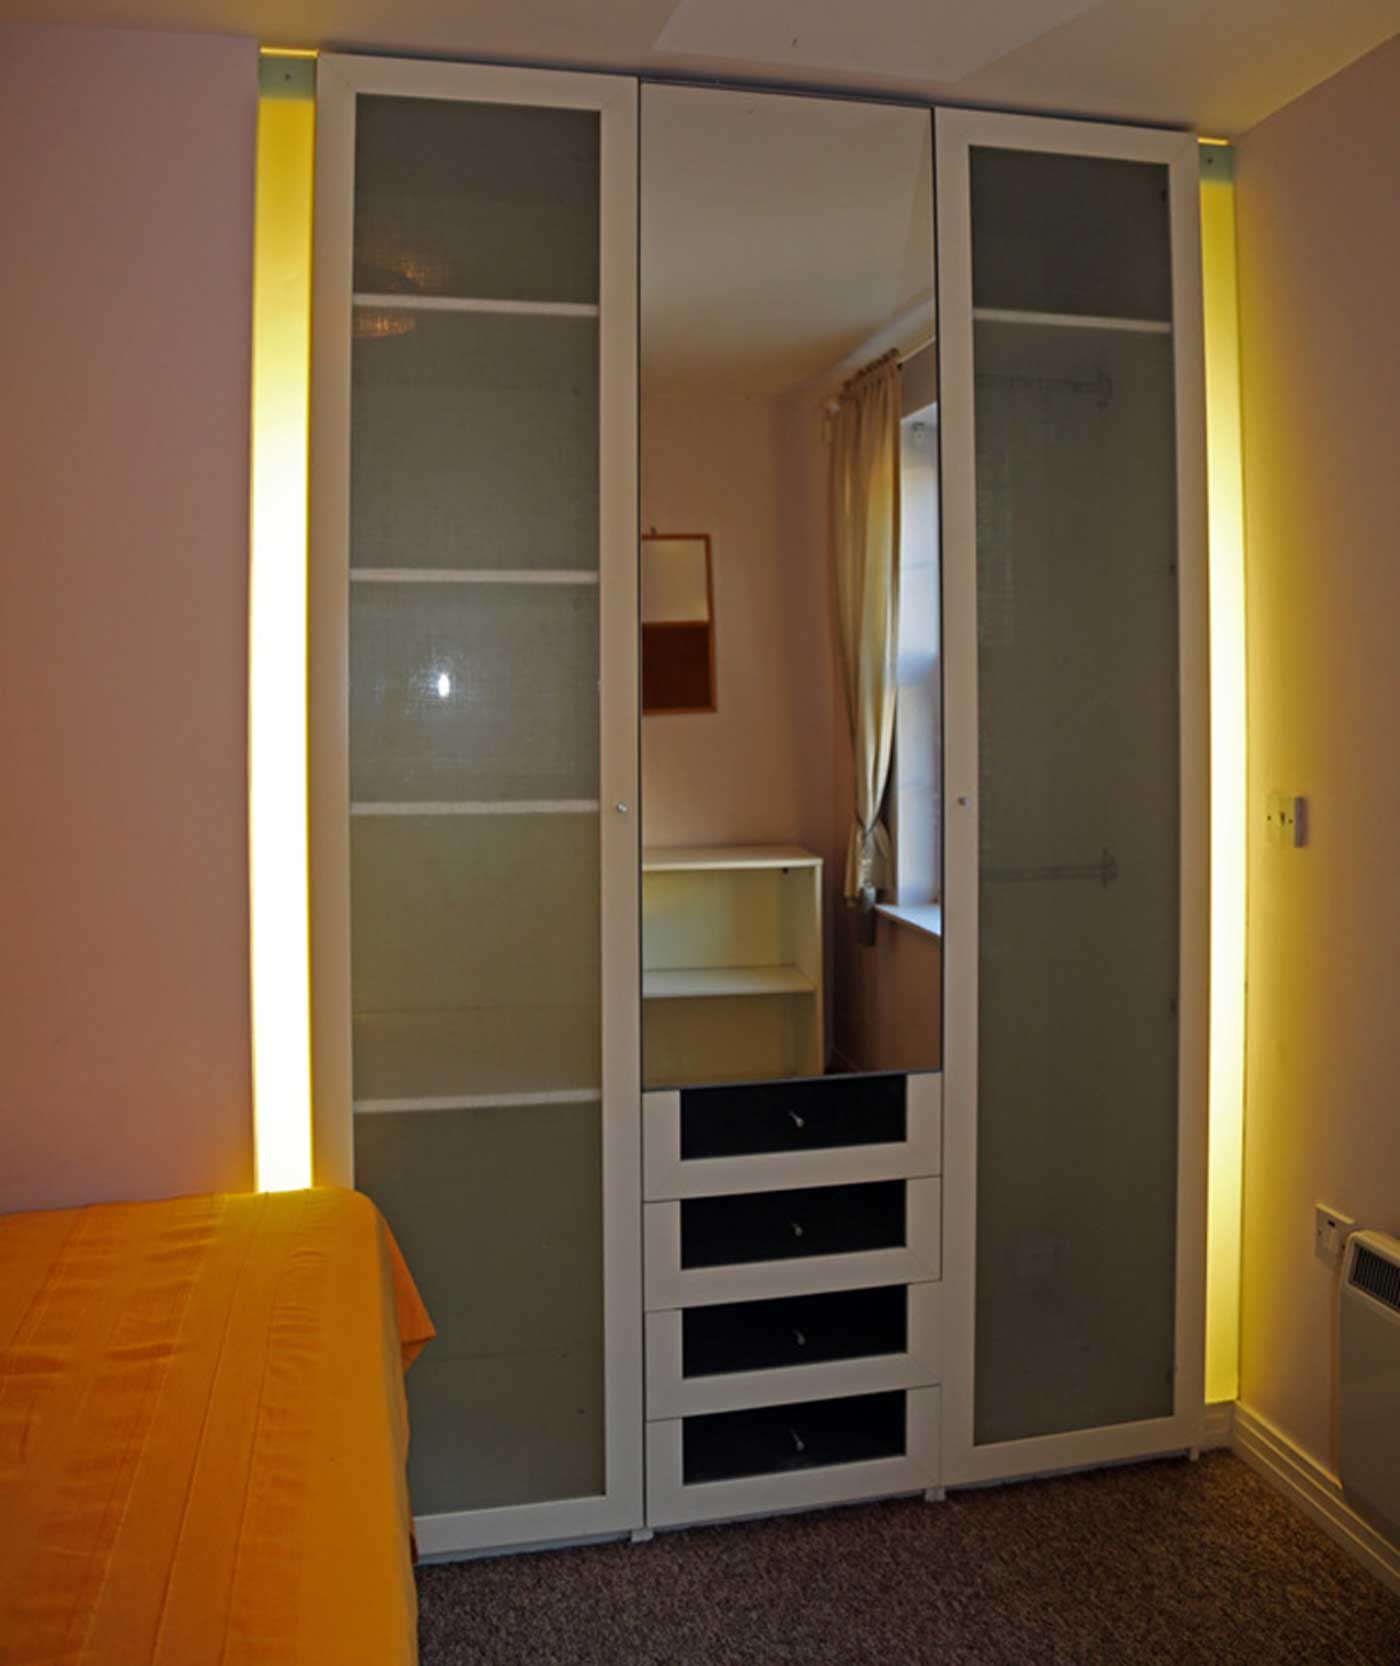 Flat to rent in London SE1 - Bedroom 2 Wardrobe